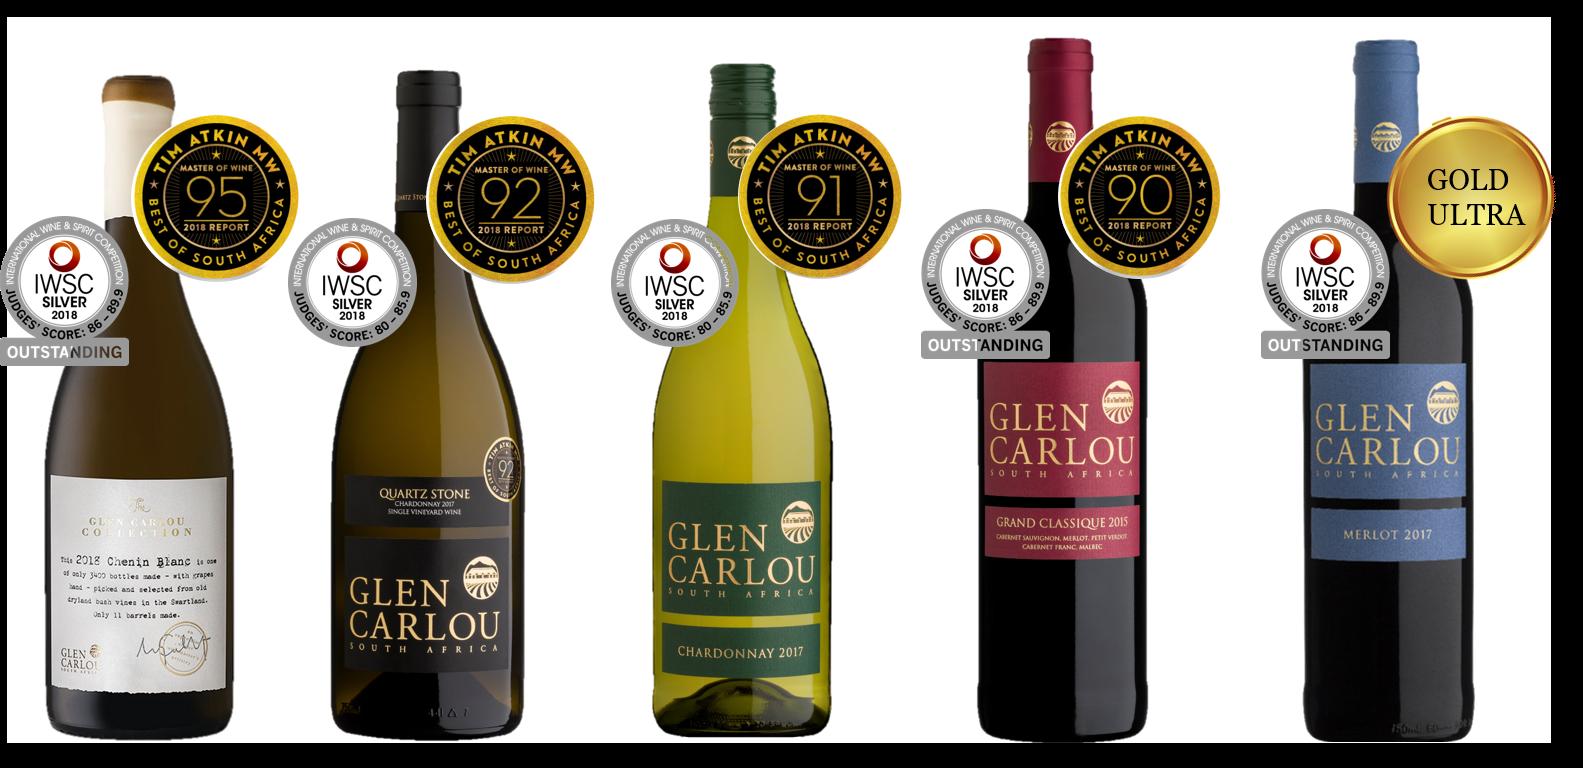 Top scores for Glen Carlou favourites photo